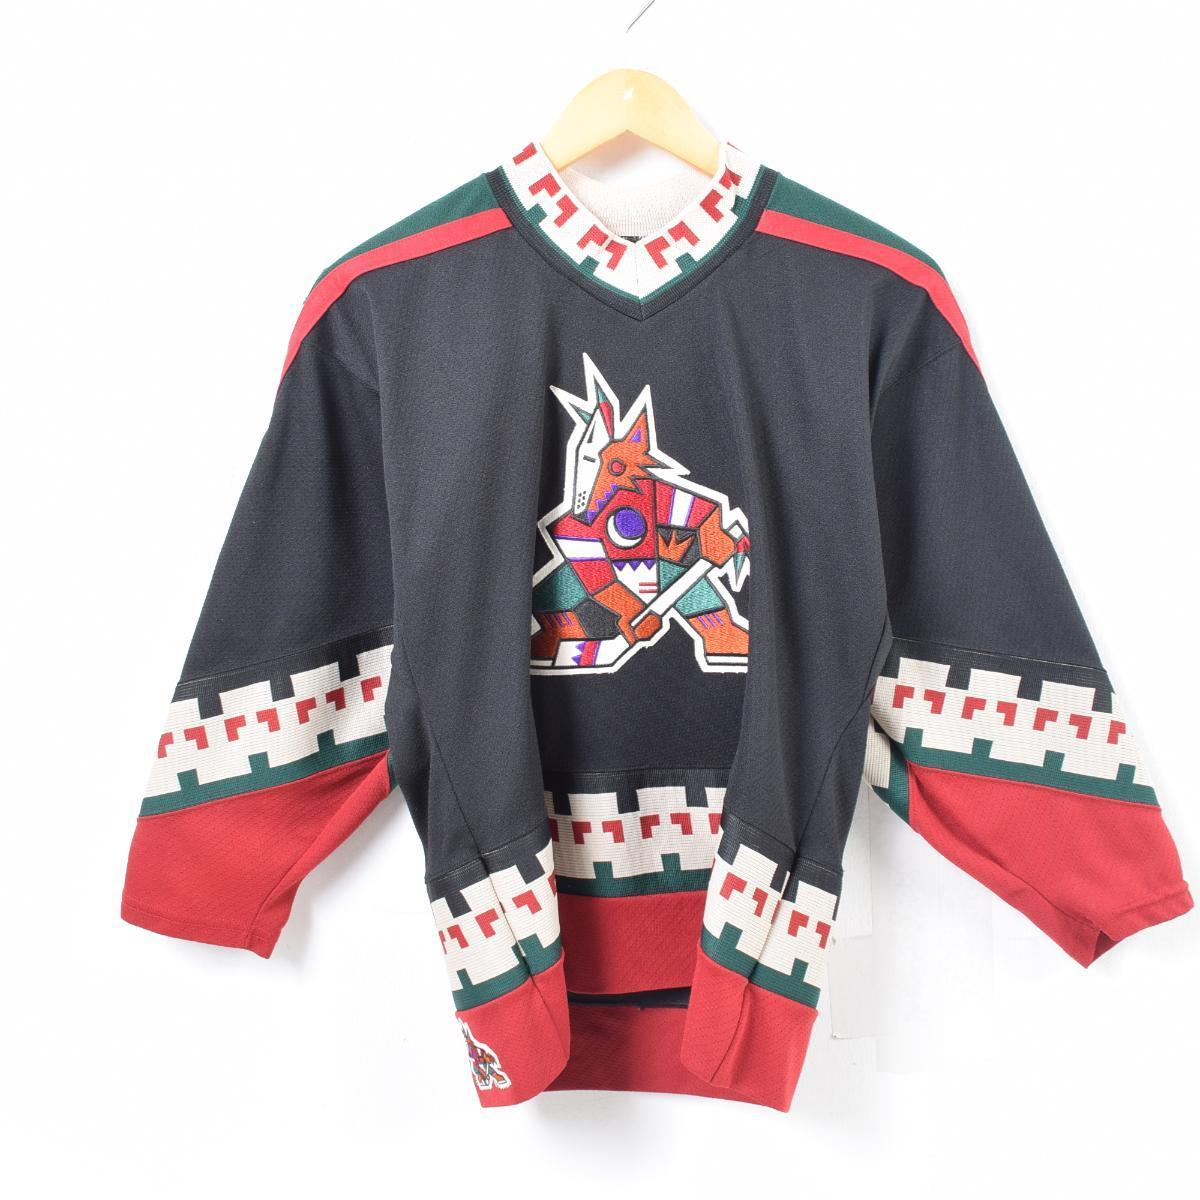 CCM NHL PHOENIX COYOTES フェニックスコヨーテズ ゲームシャツ レプリカユニフォーム カナダ製 メンズS /waq7214 【中古】【古着屋JAM】 【180622】